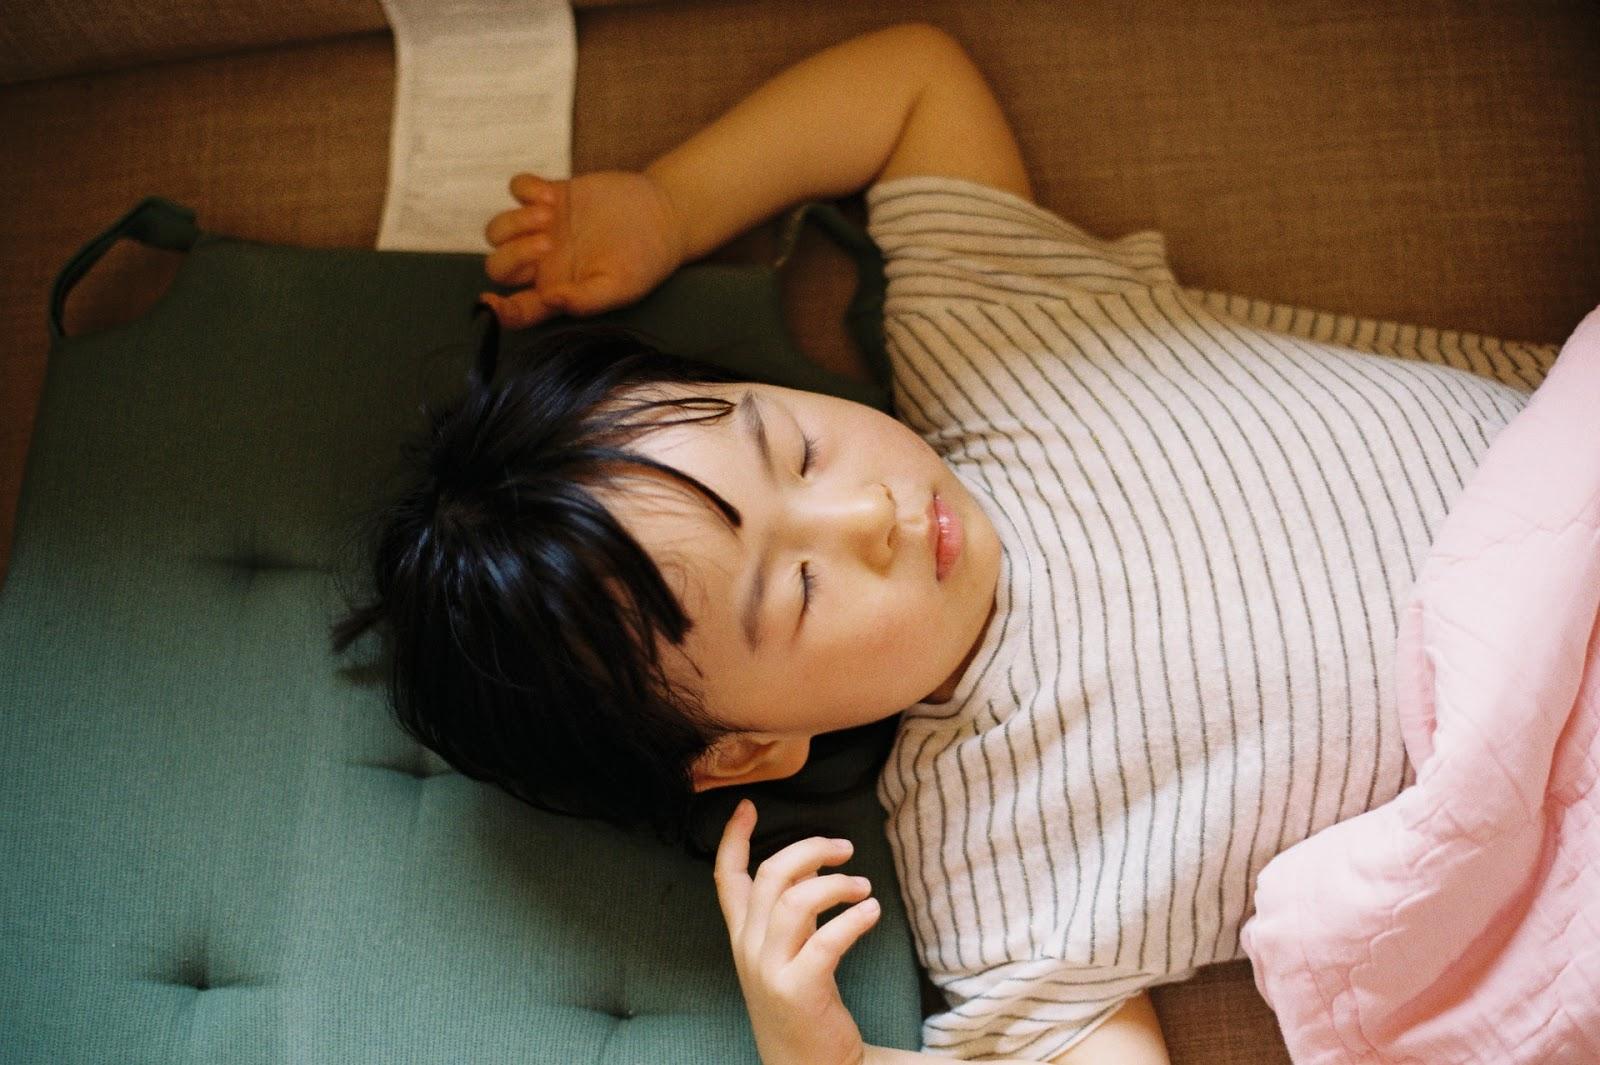 child sleeping on green sofa